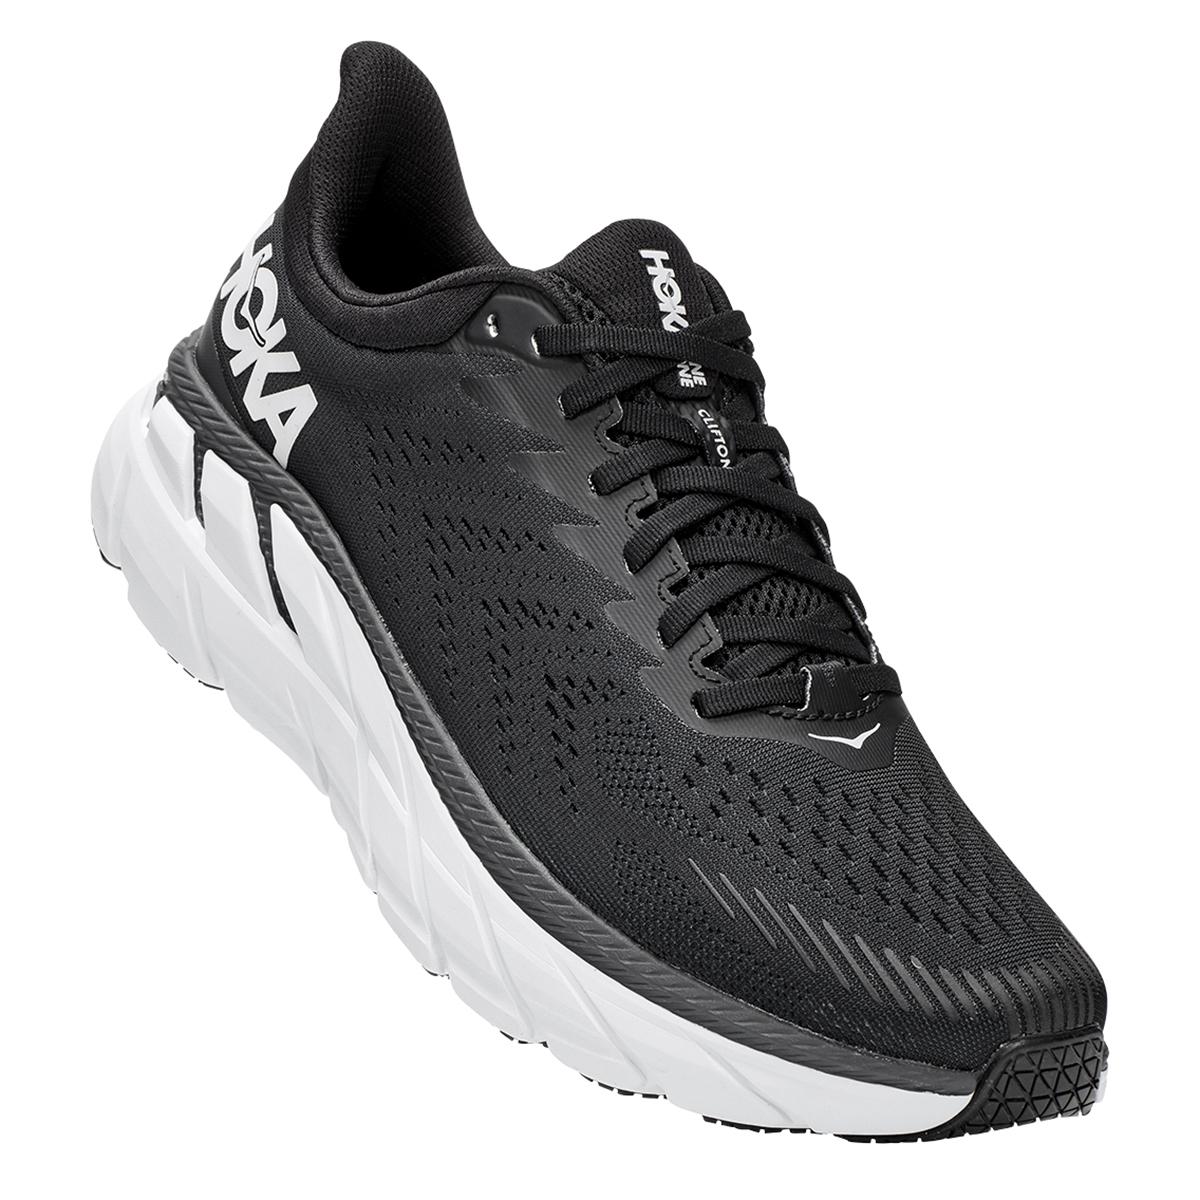 Men's Hoka One One Clifton 7 Running Shoe - Color: Black/White - Size: 7 - Width: Regular, Black/White, large, image 4